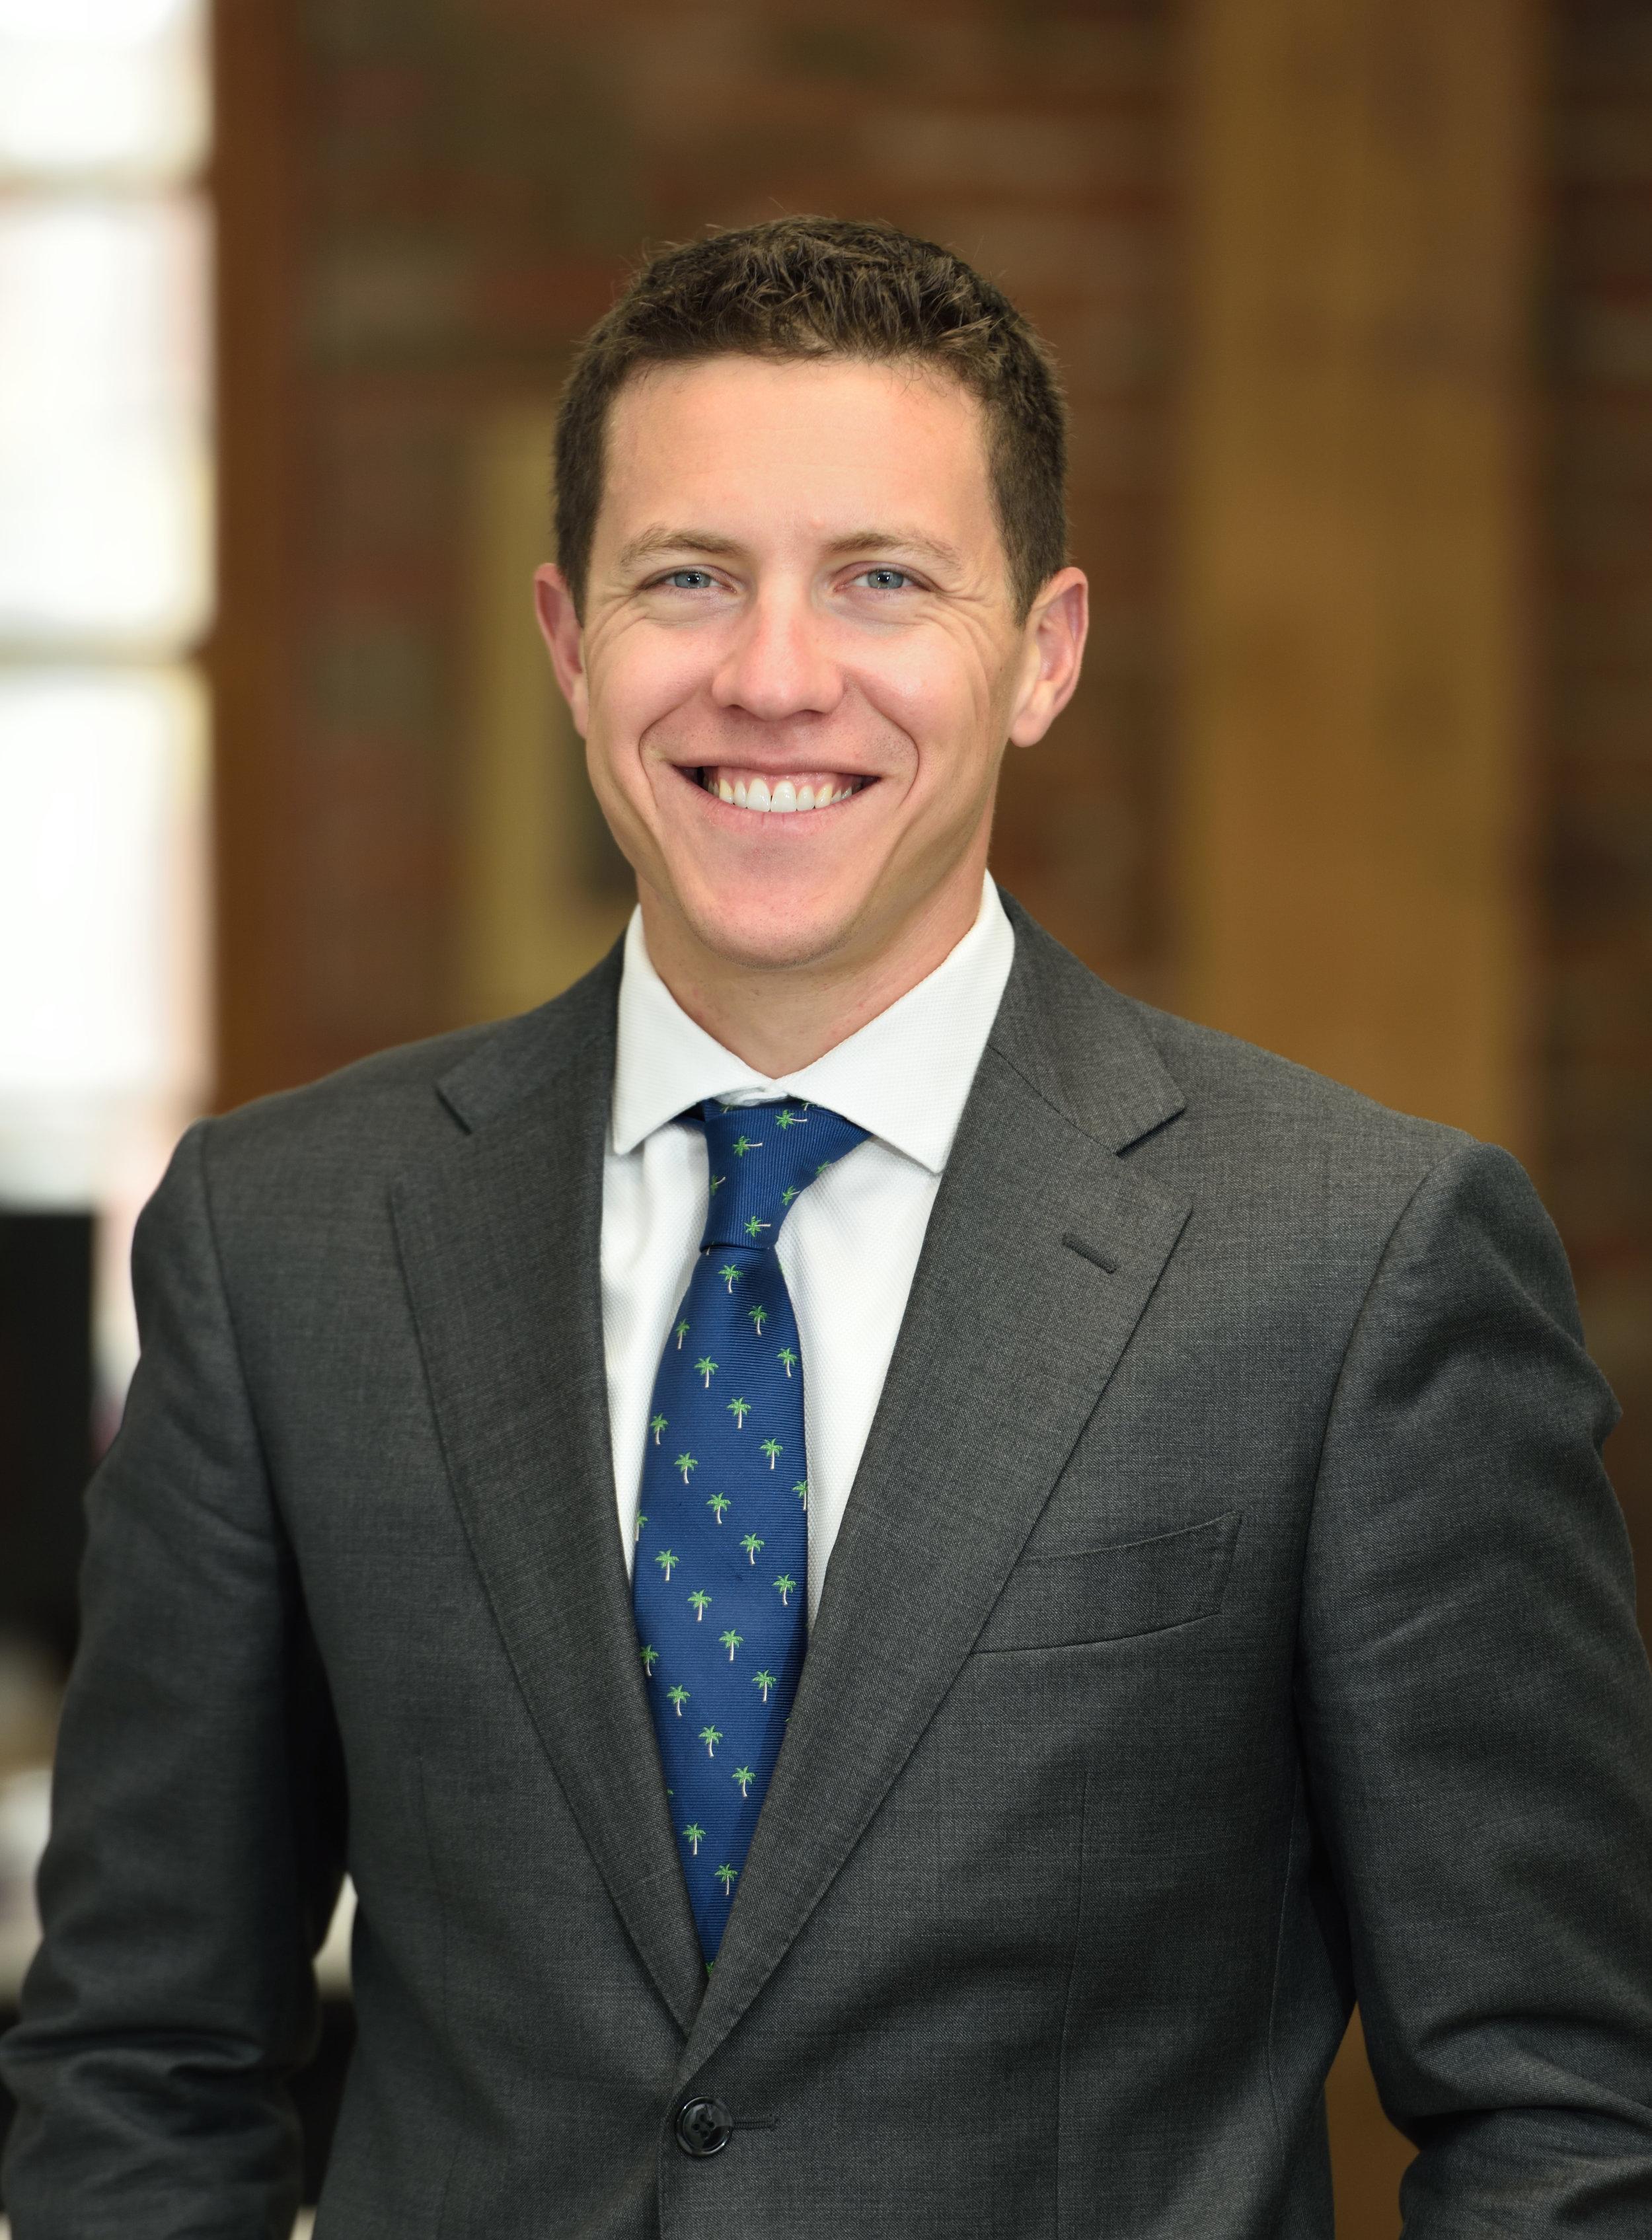 Joseph Lavoie, National Practice Lead, Campaigns and Digital Mobilization -